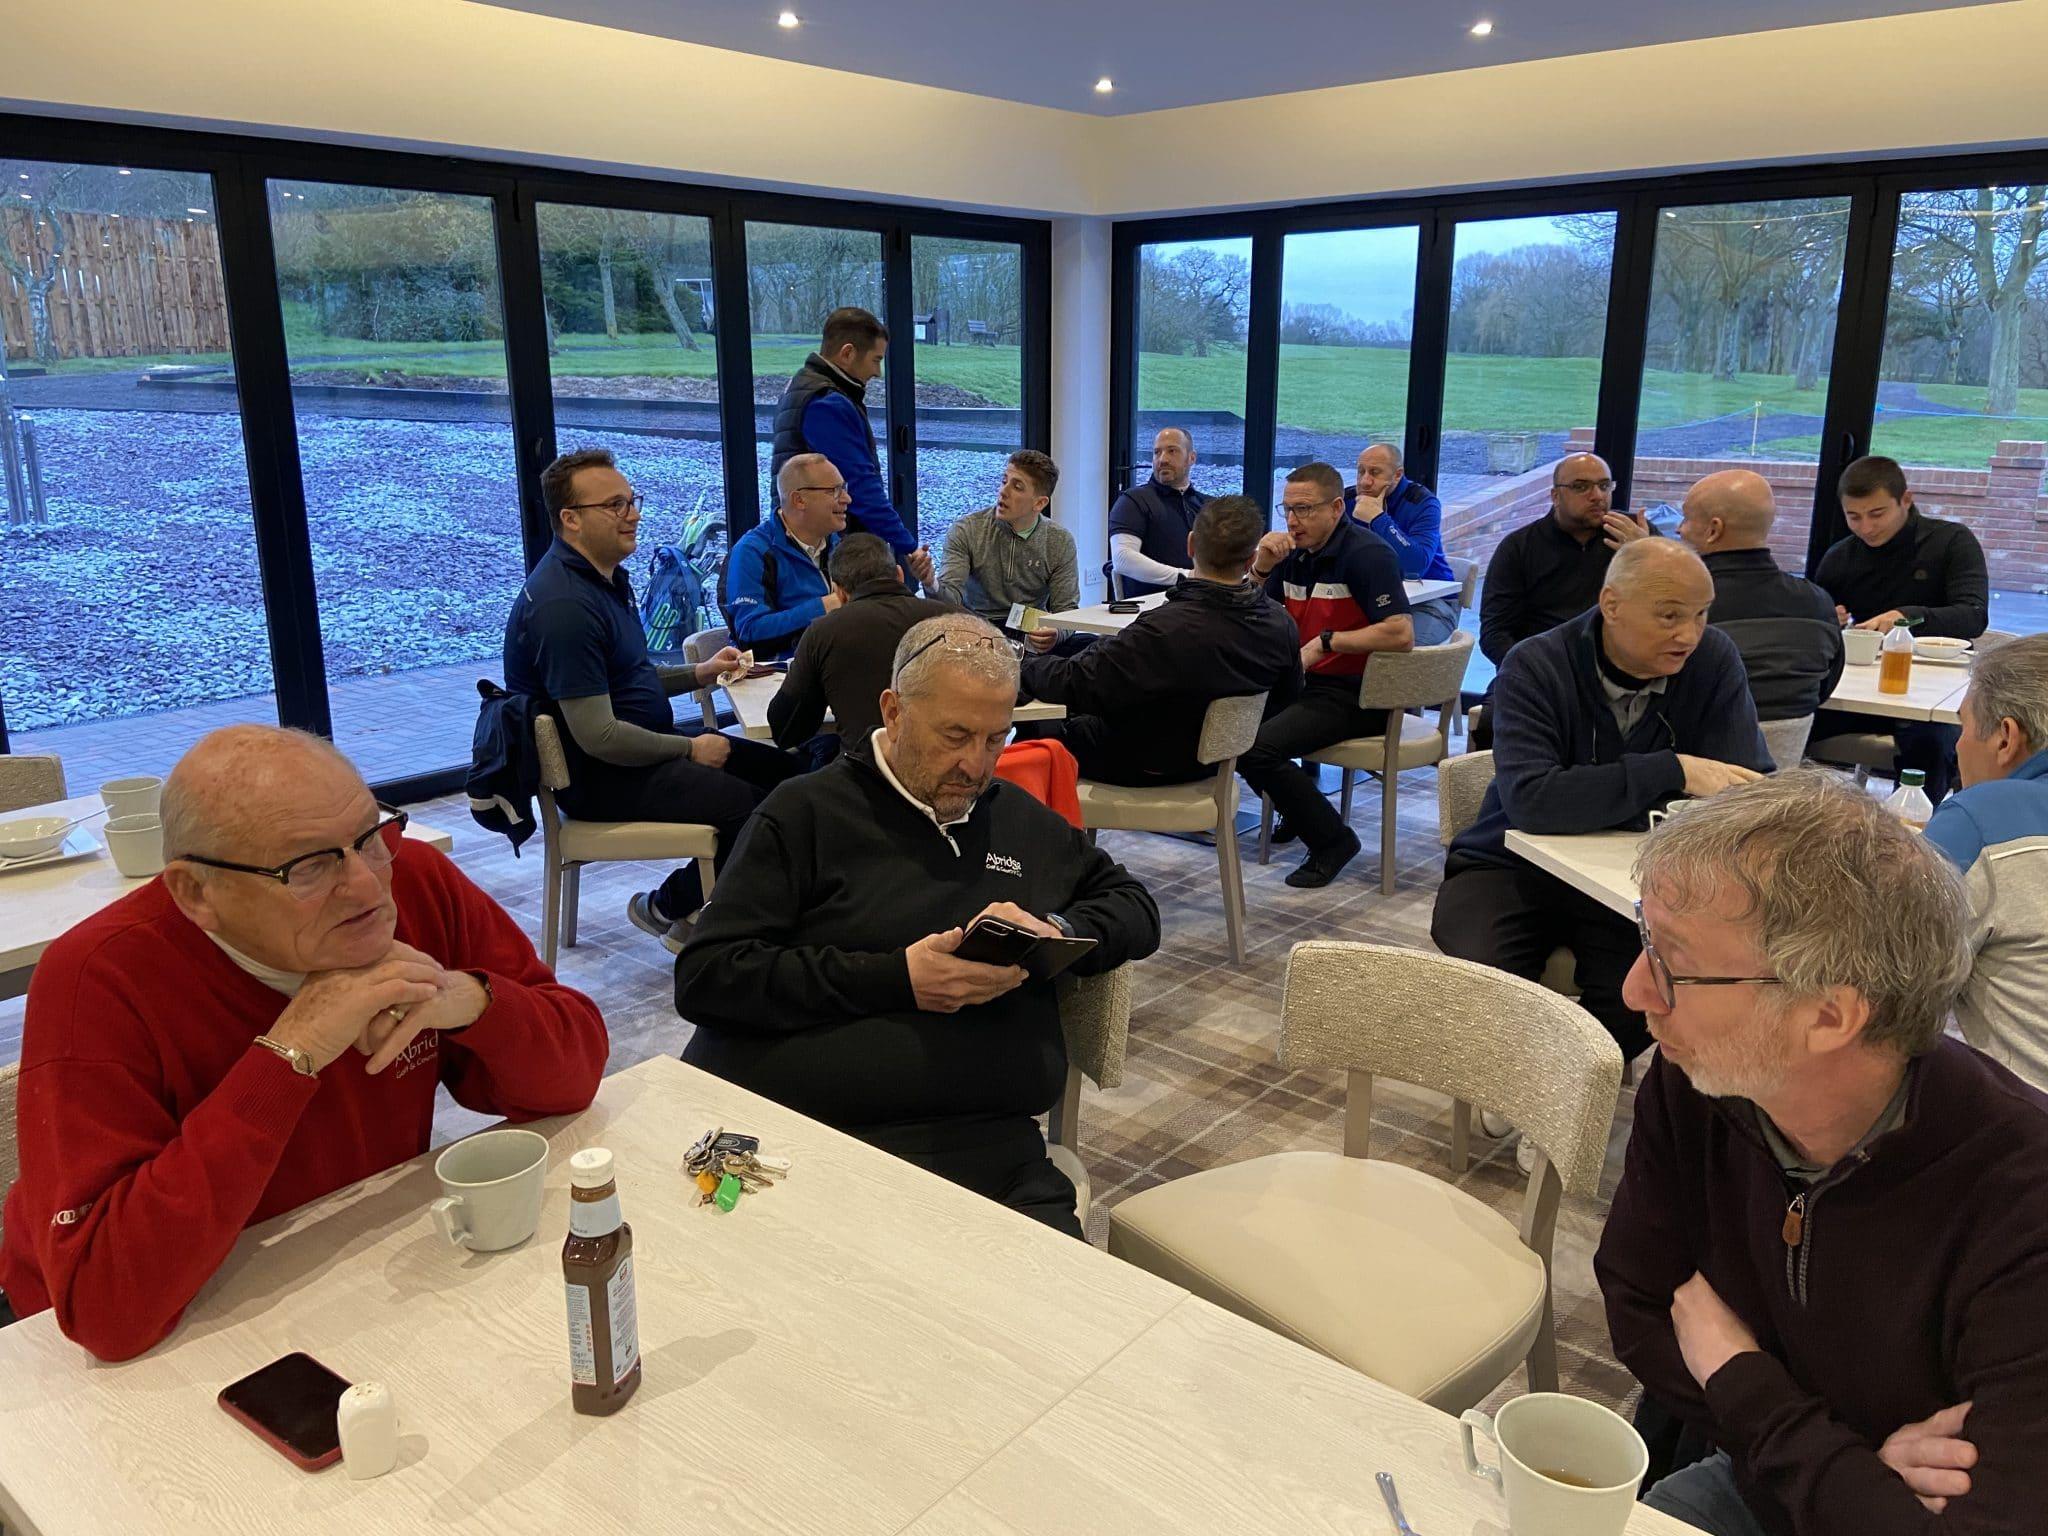 abridge golf club the lounge